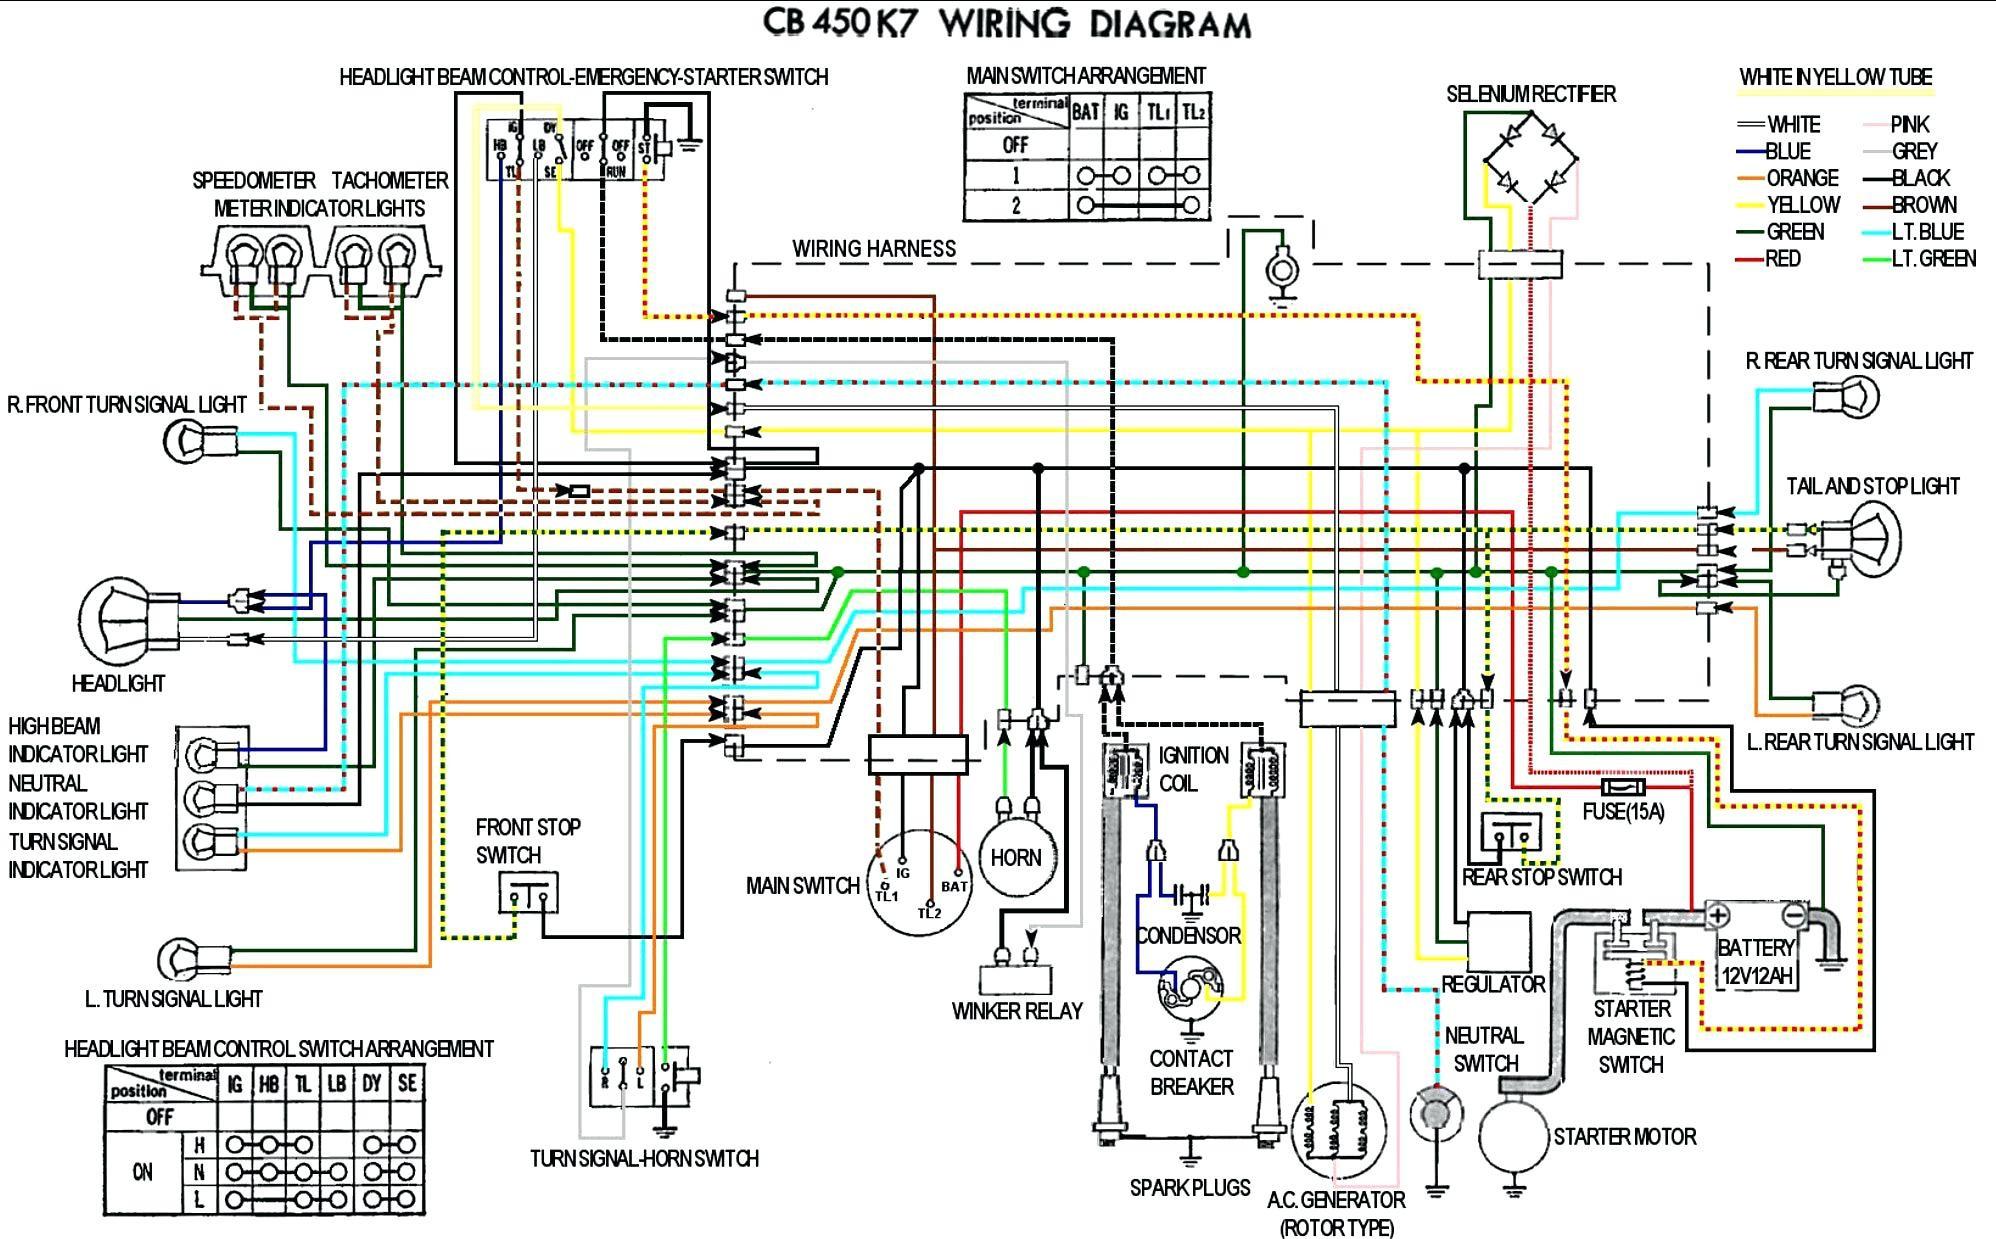 John Deere 214 Wiring Harness Diagram Libraries Lawn Tractor Lt155 Todayslt155 Diagrams Parts